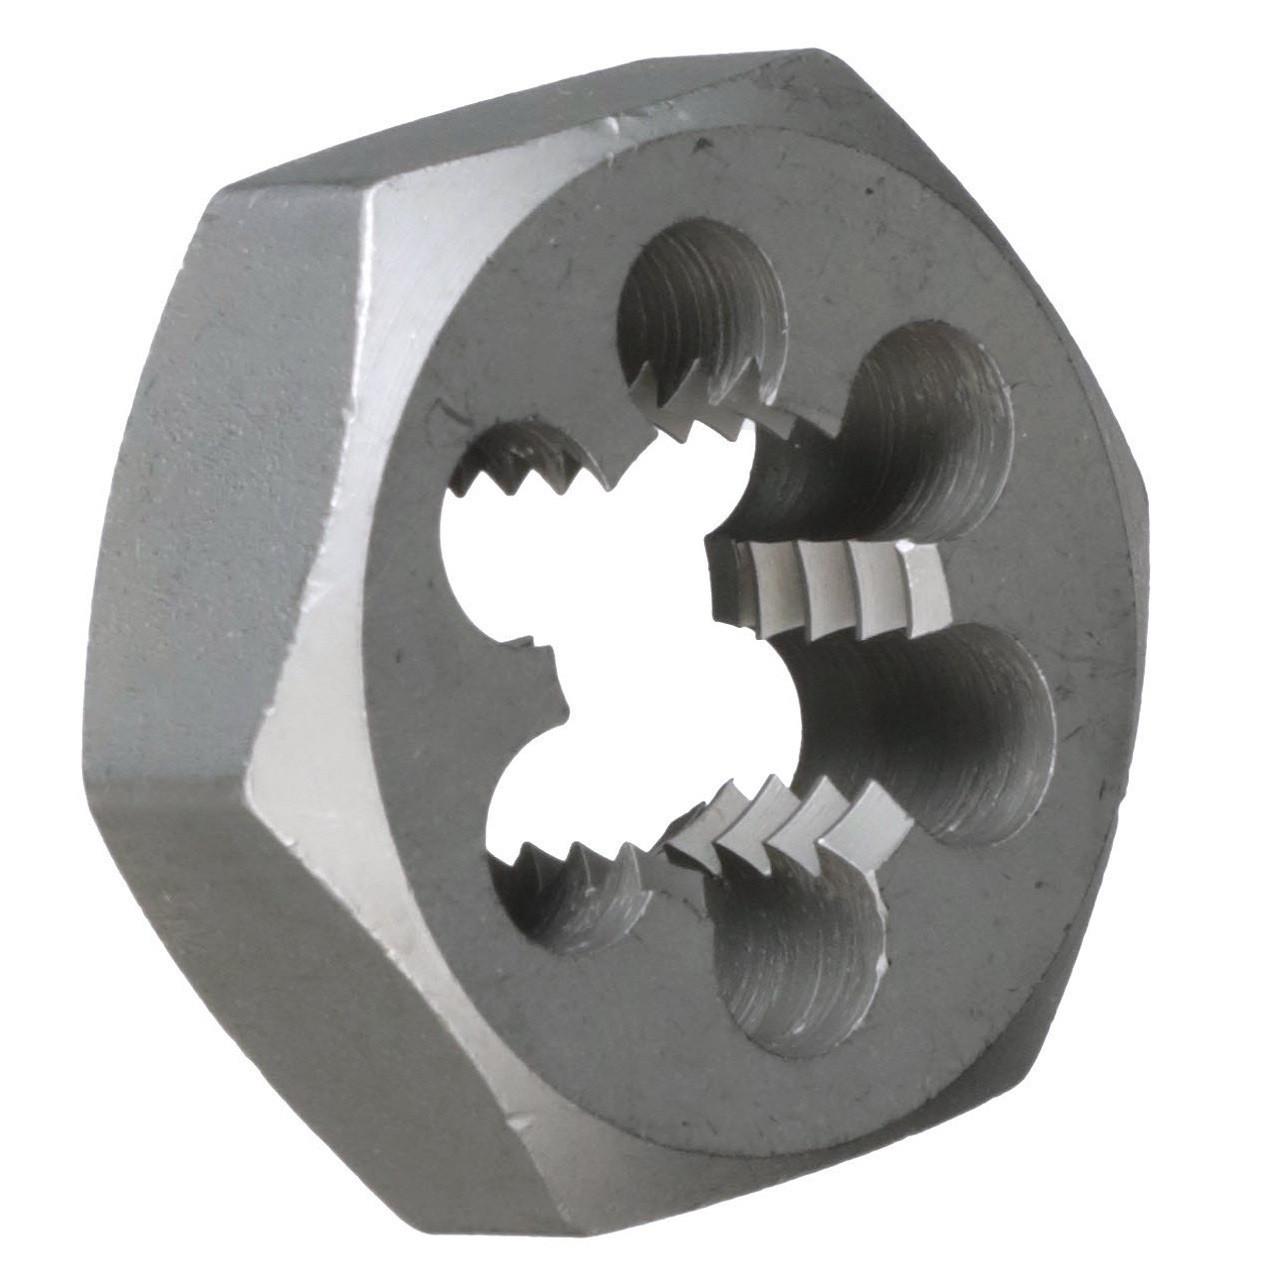 Hex Die Special Thread Fractional 1-24 Carbon Steel